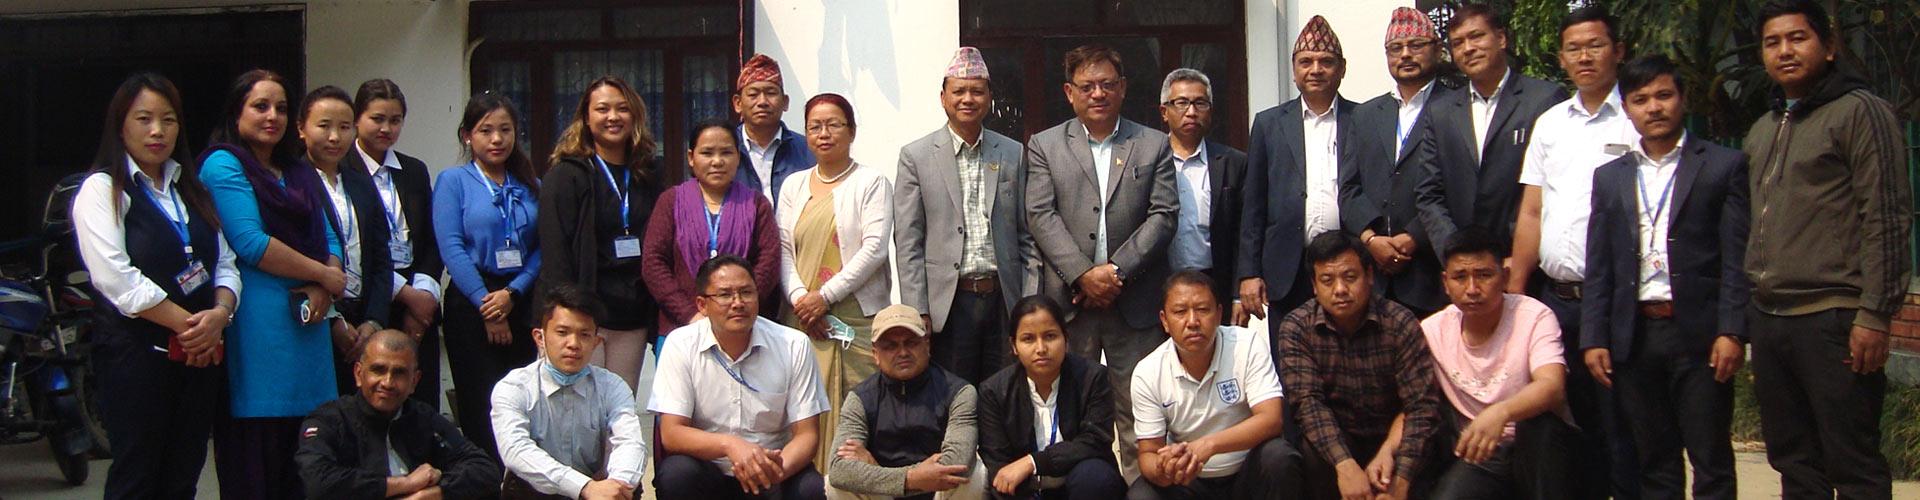 आदिवासी जनजाति आयोग परिवार (पदाधिकारी तथा कर्मचारीहरु)